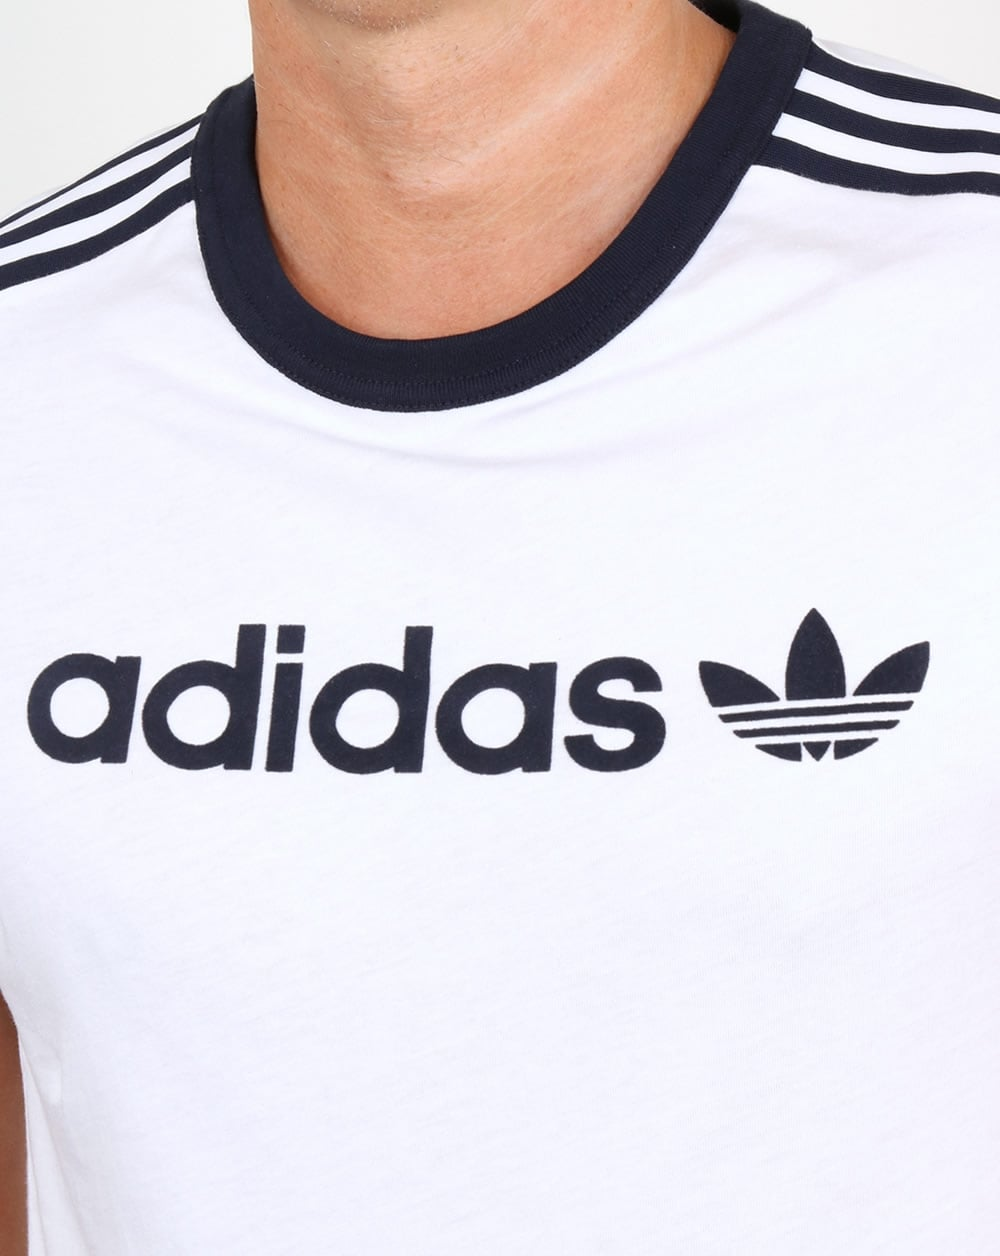 a56c49f0 Adidas Originals Linear T Shirt White,ringer,3 stripes,tee,mens